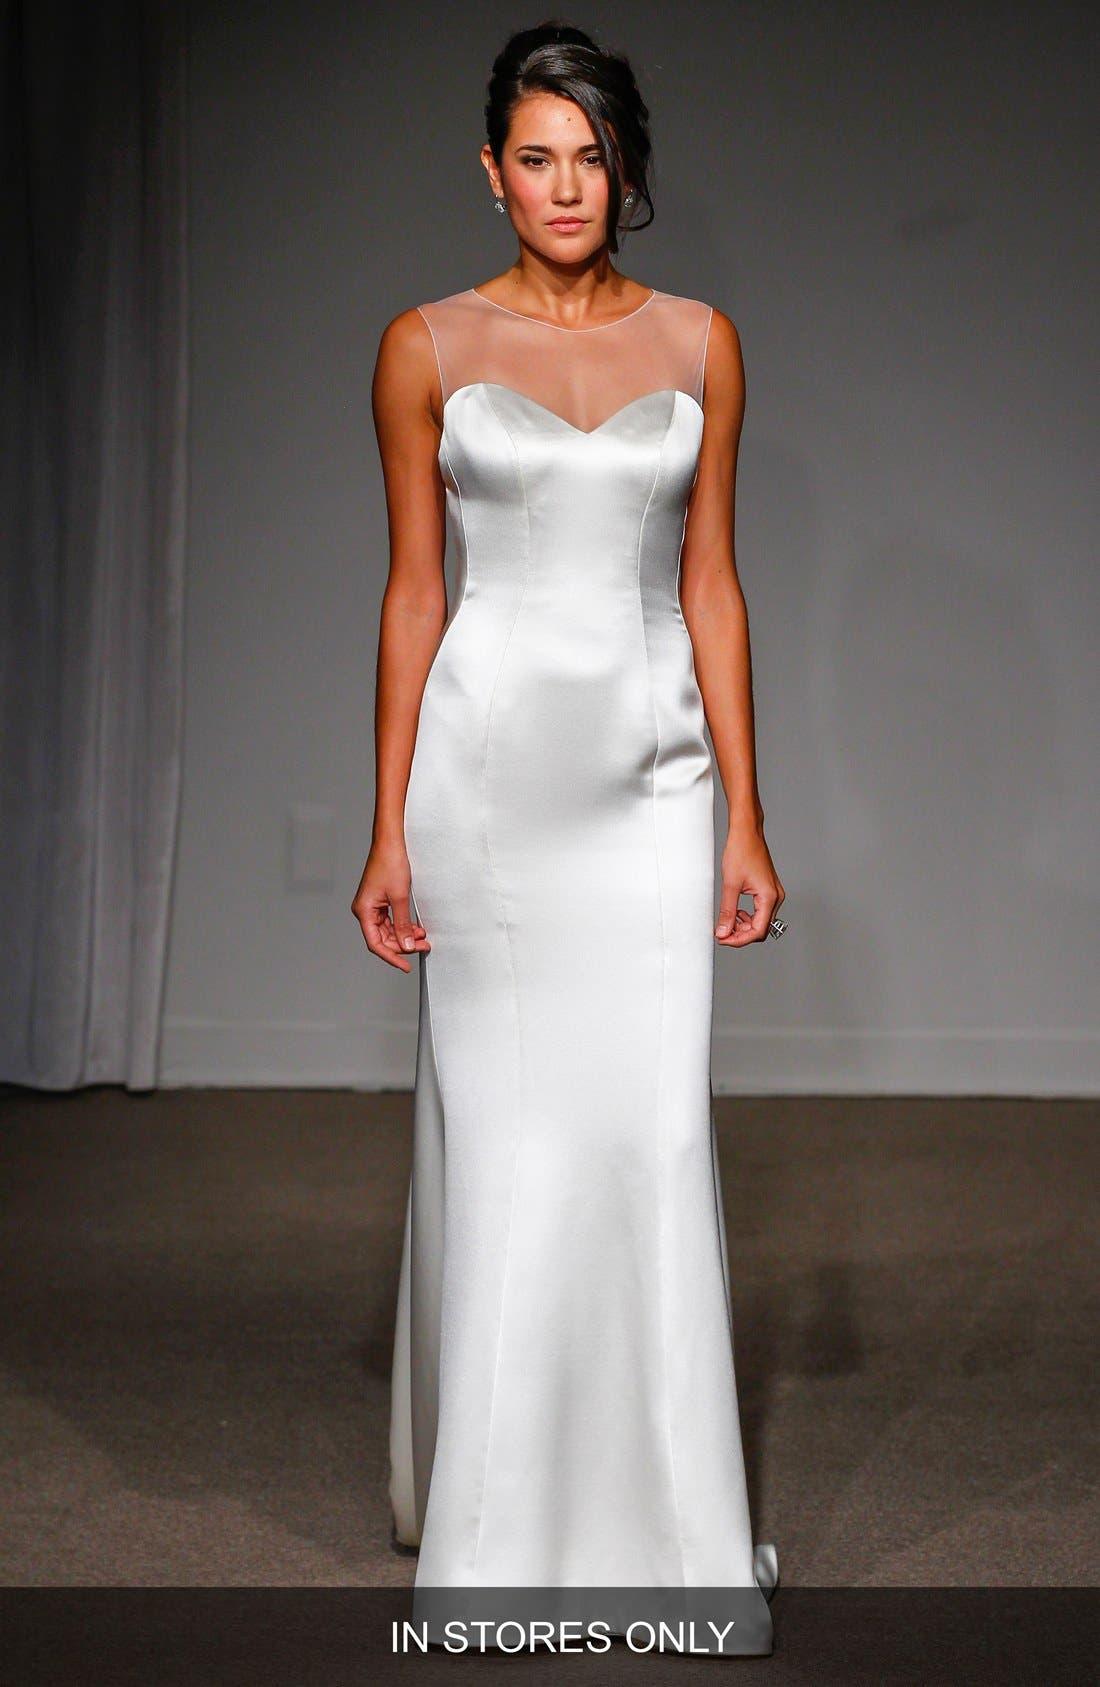 Nicole Illusion Neck Satin A-Line Gown,                             Main thumbnail 1, color,                             100